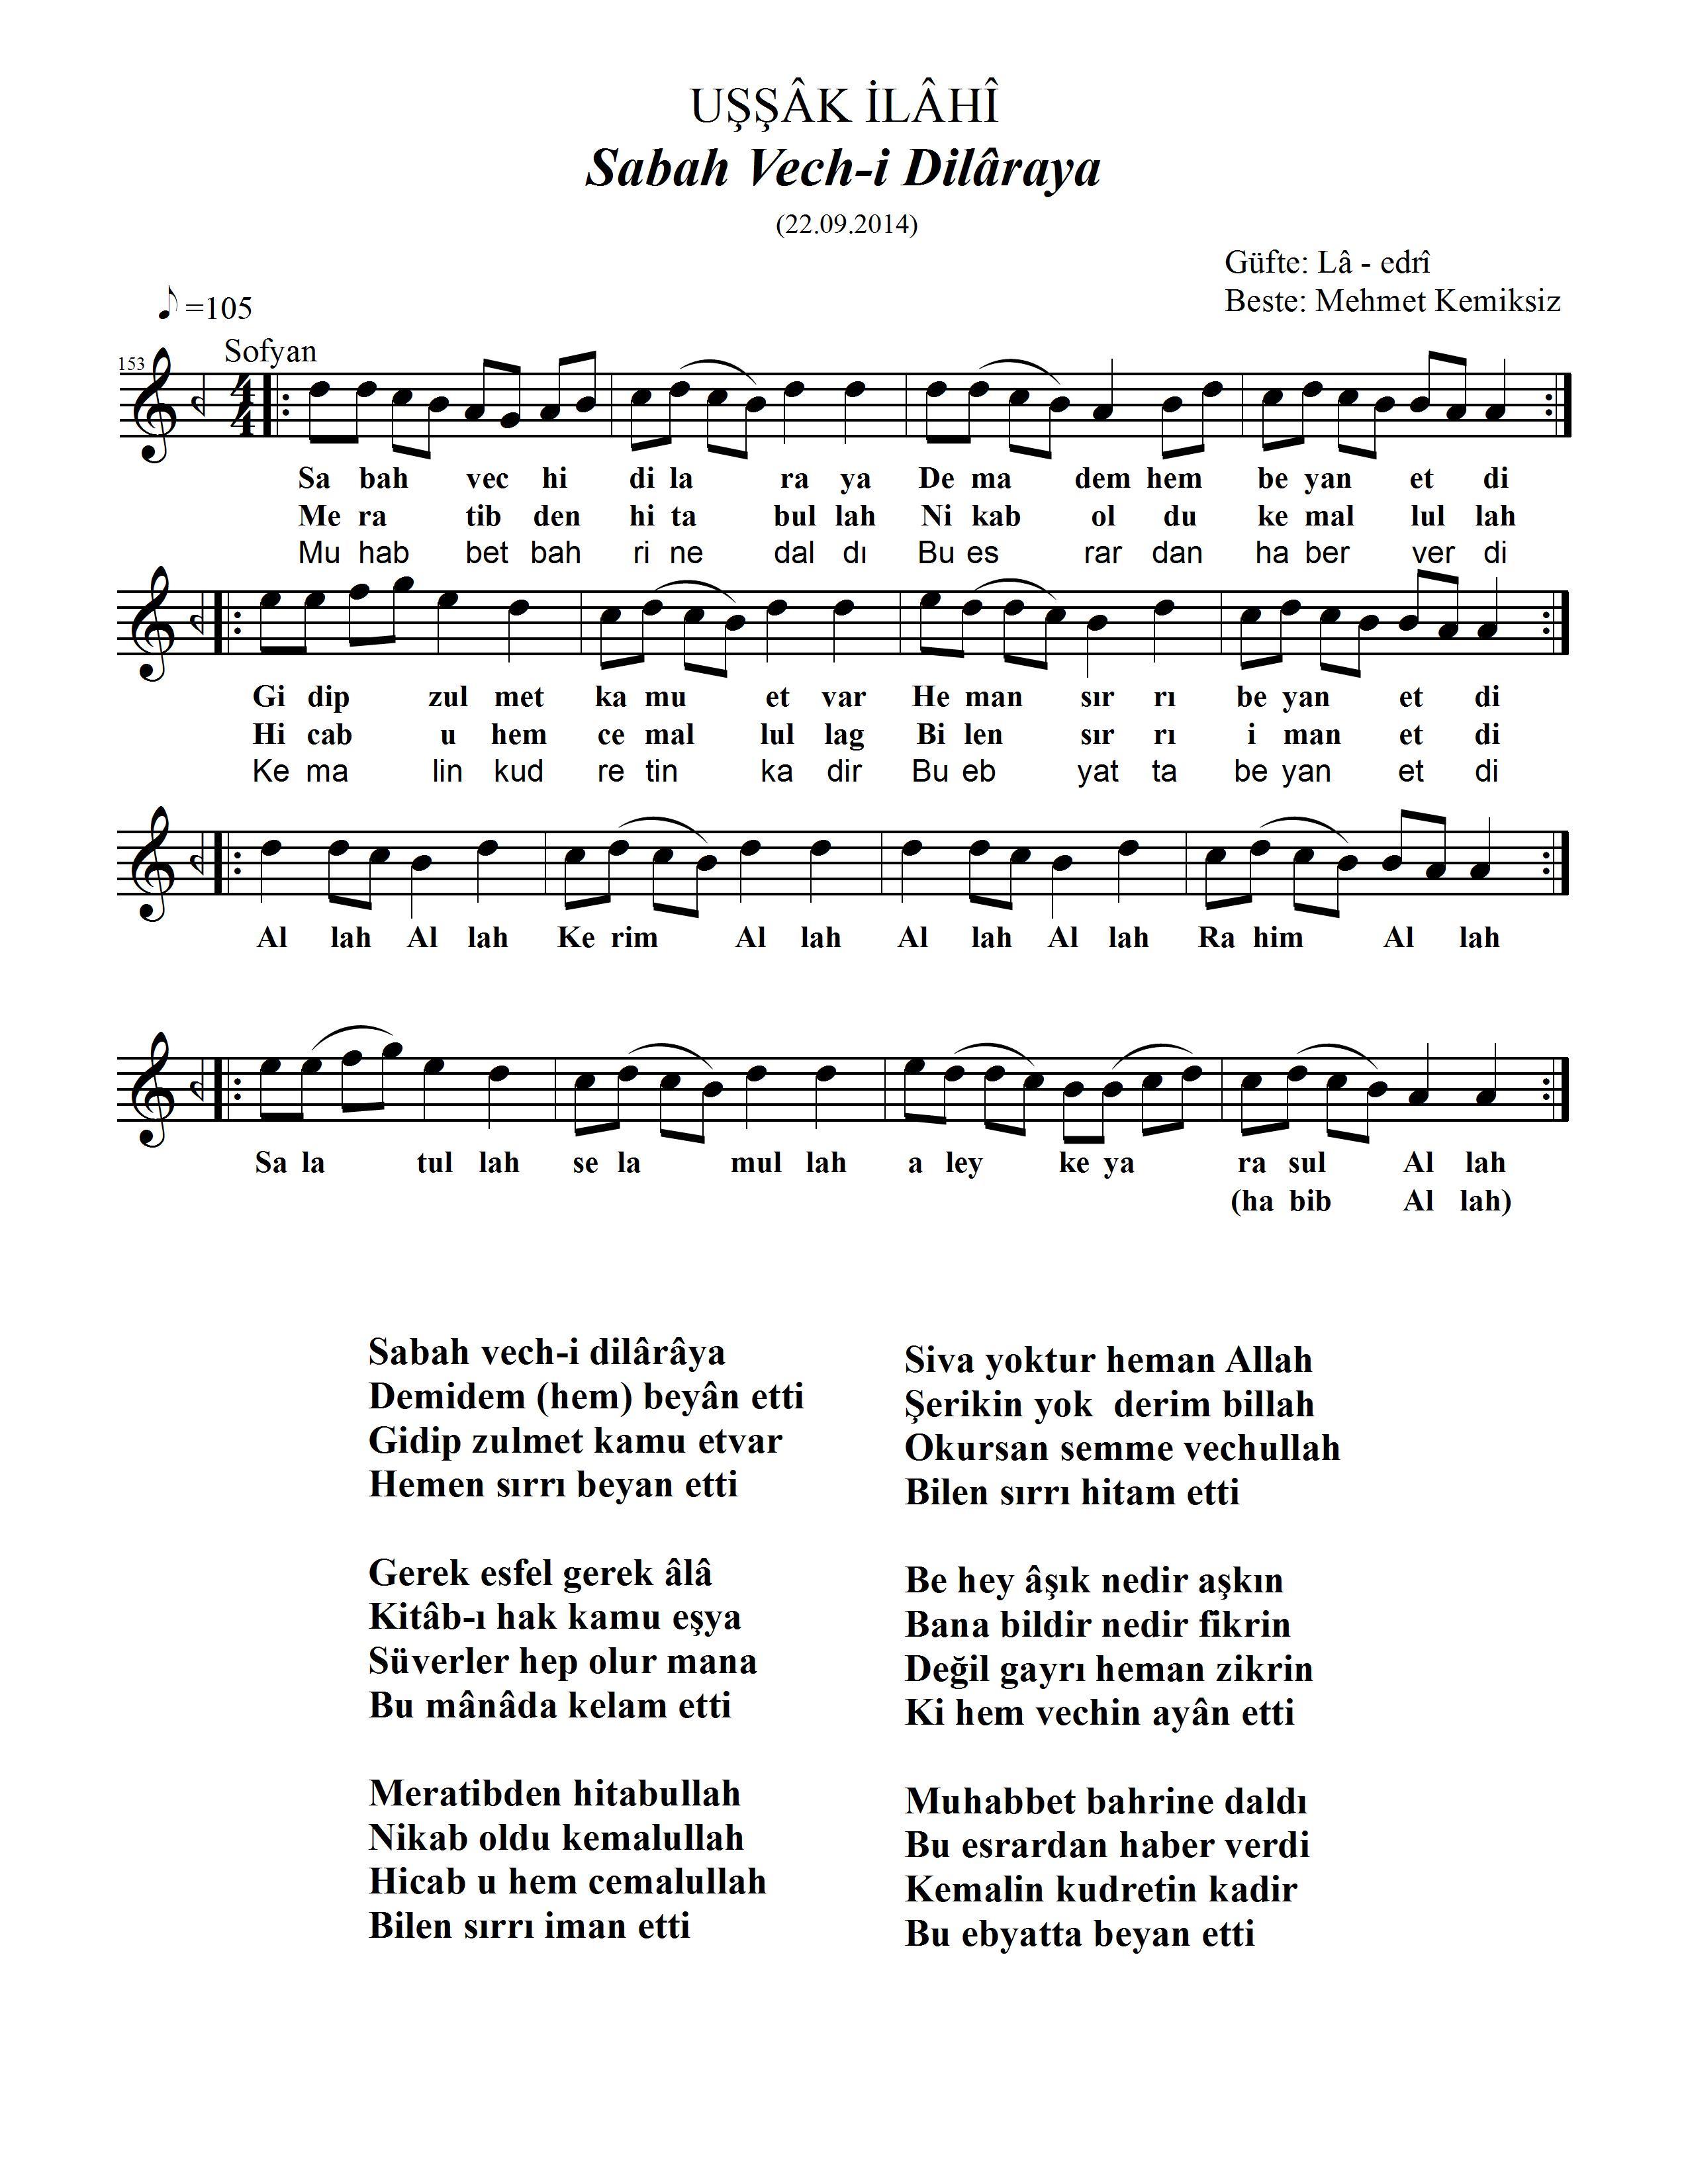 153-Ussak-Sabah Vechi